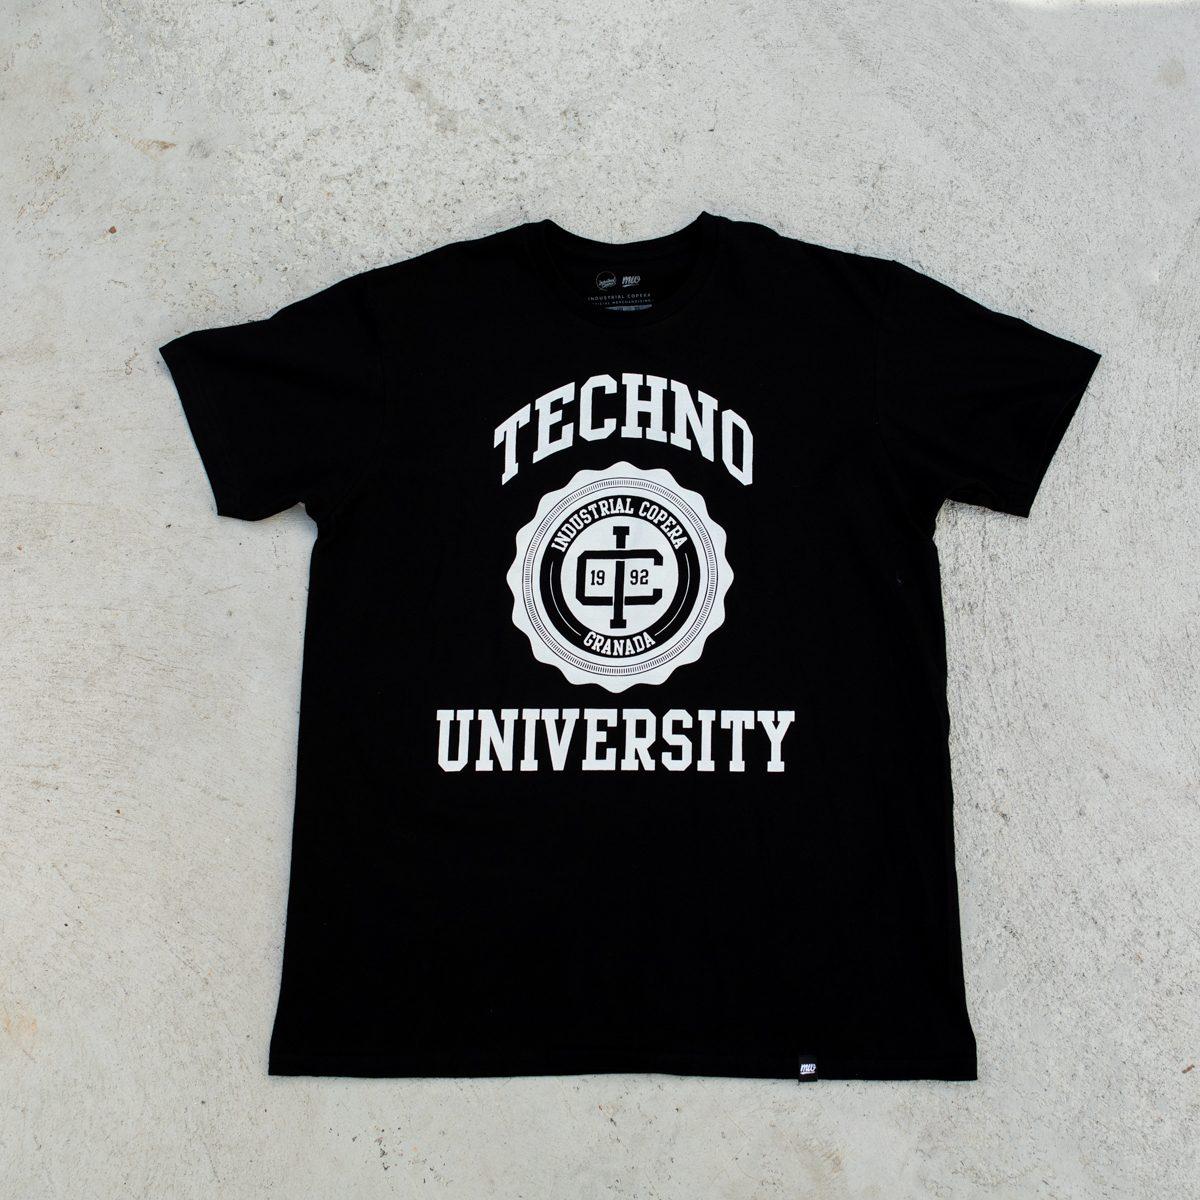 Camiseta negra Industrial Copera Techno University